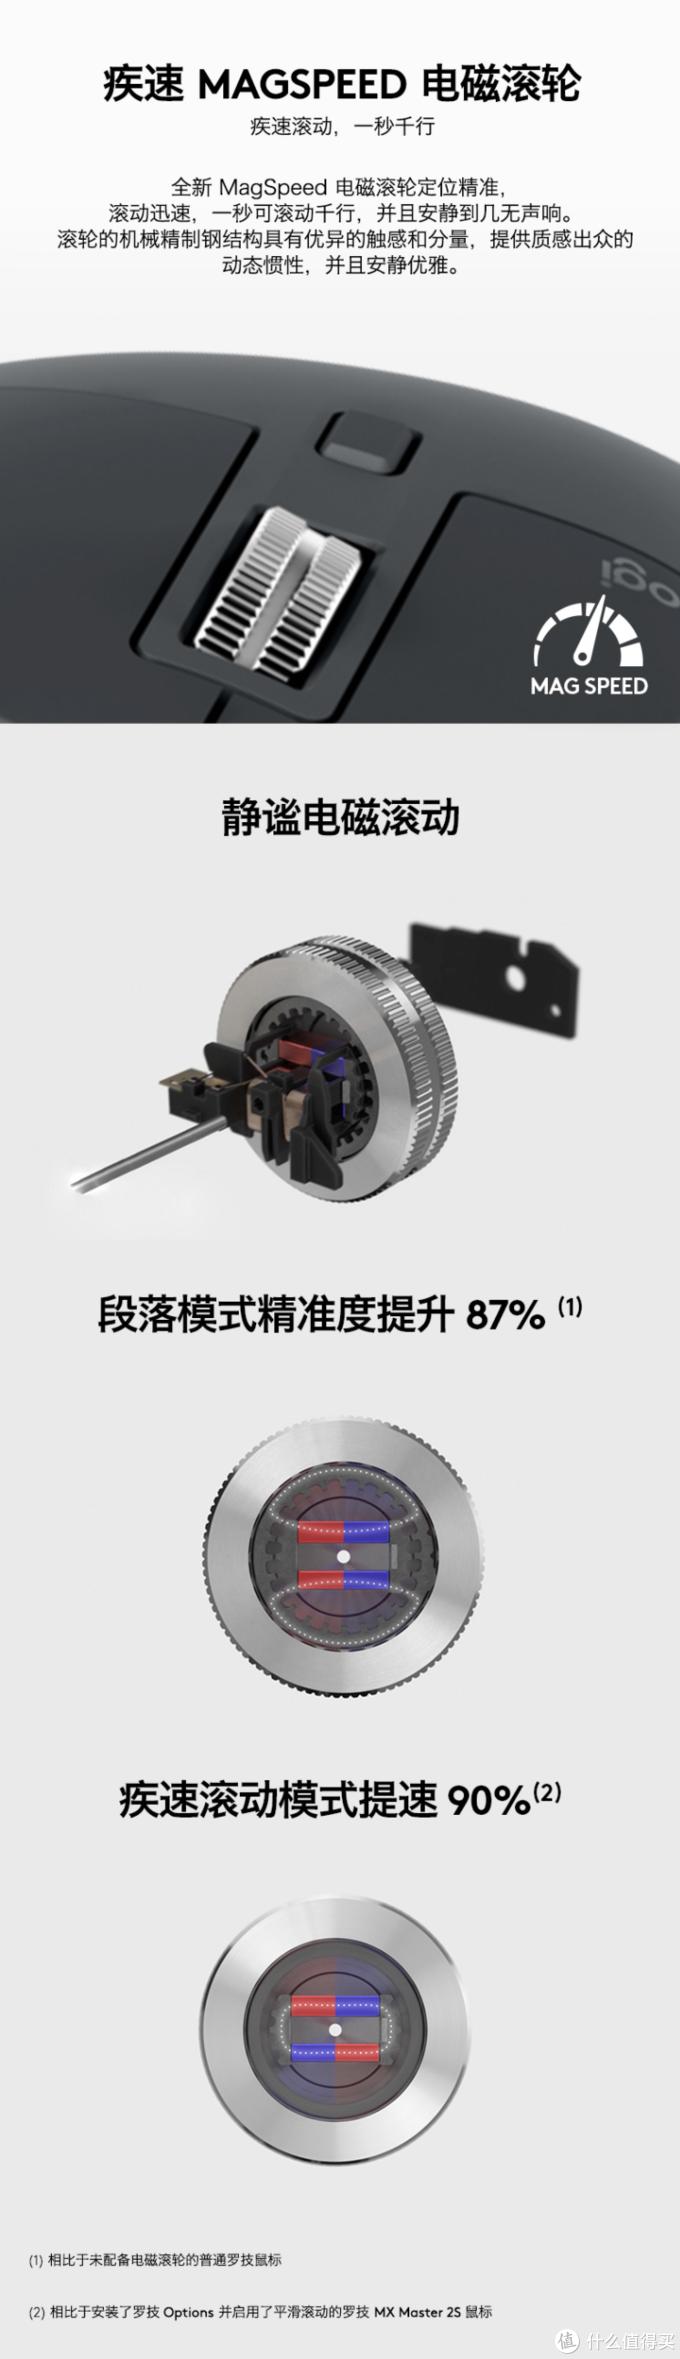 MAG SPEED电磁滚轮